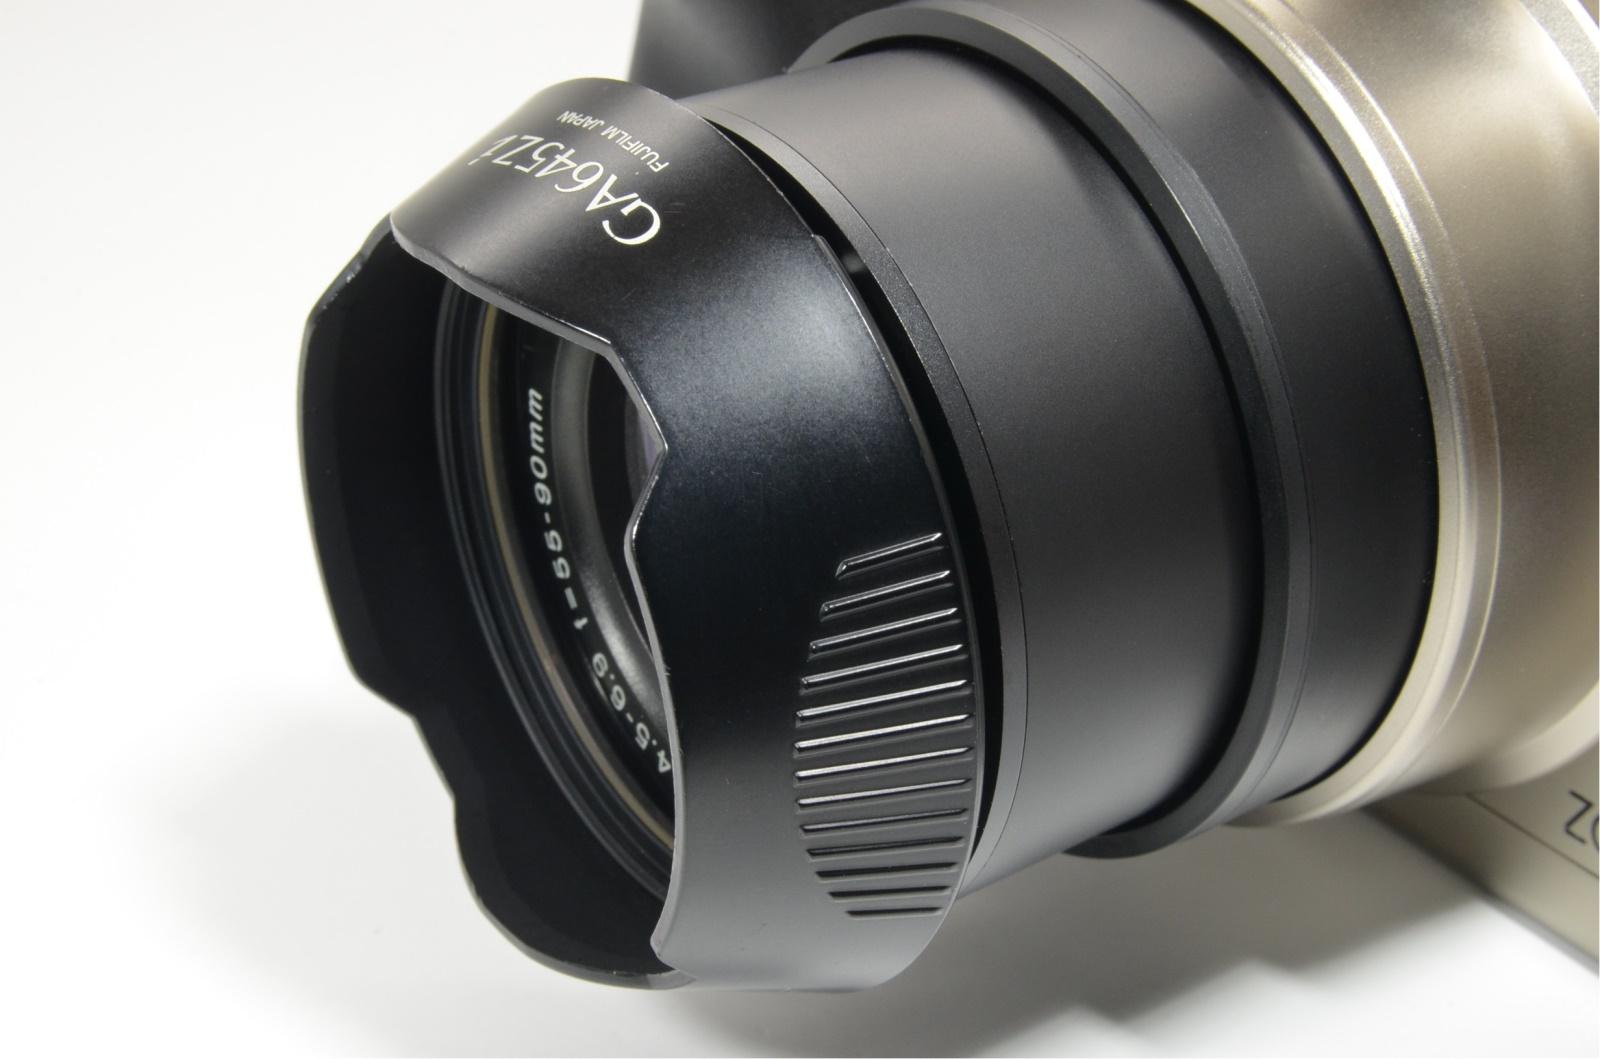 fuji fujifilm ga645zi fujinon 55-90mm f4.5-6.9 camera from japan shooting tested